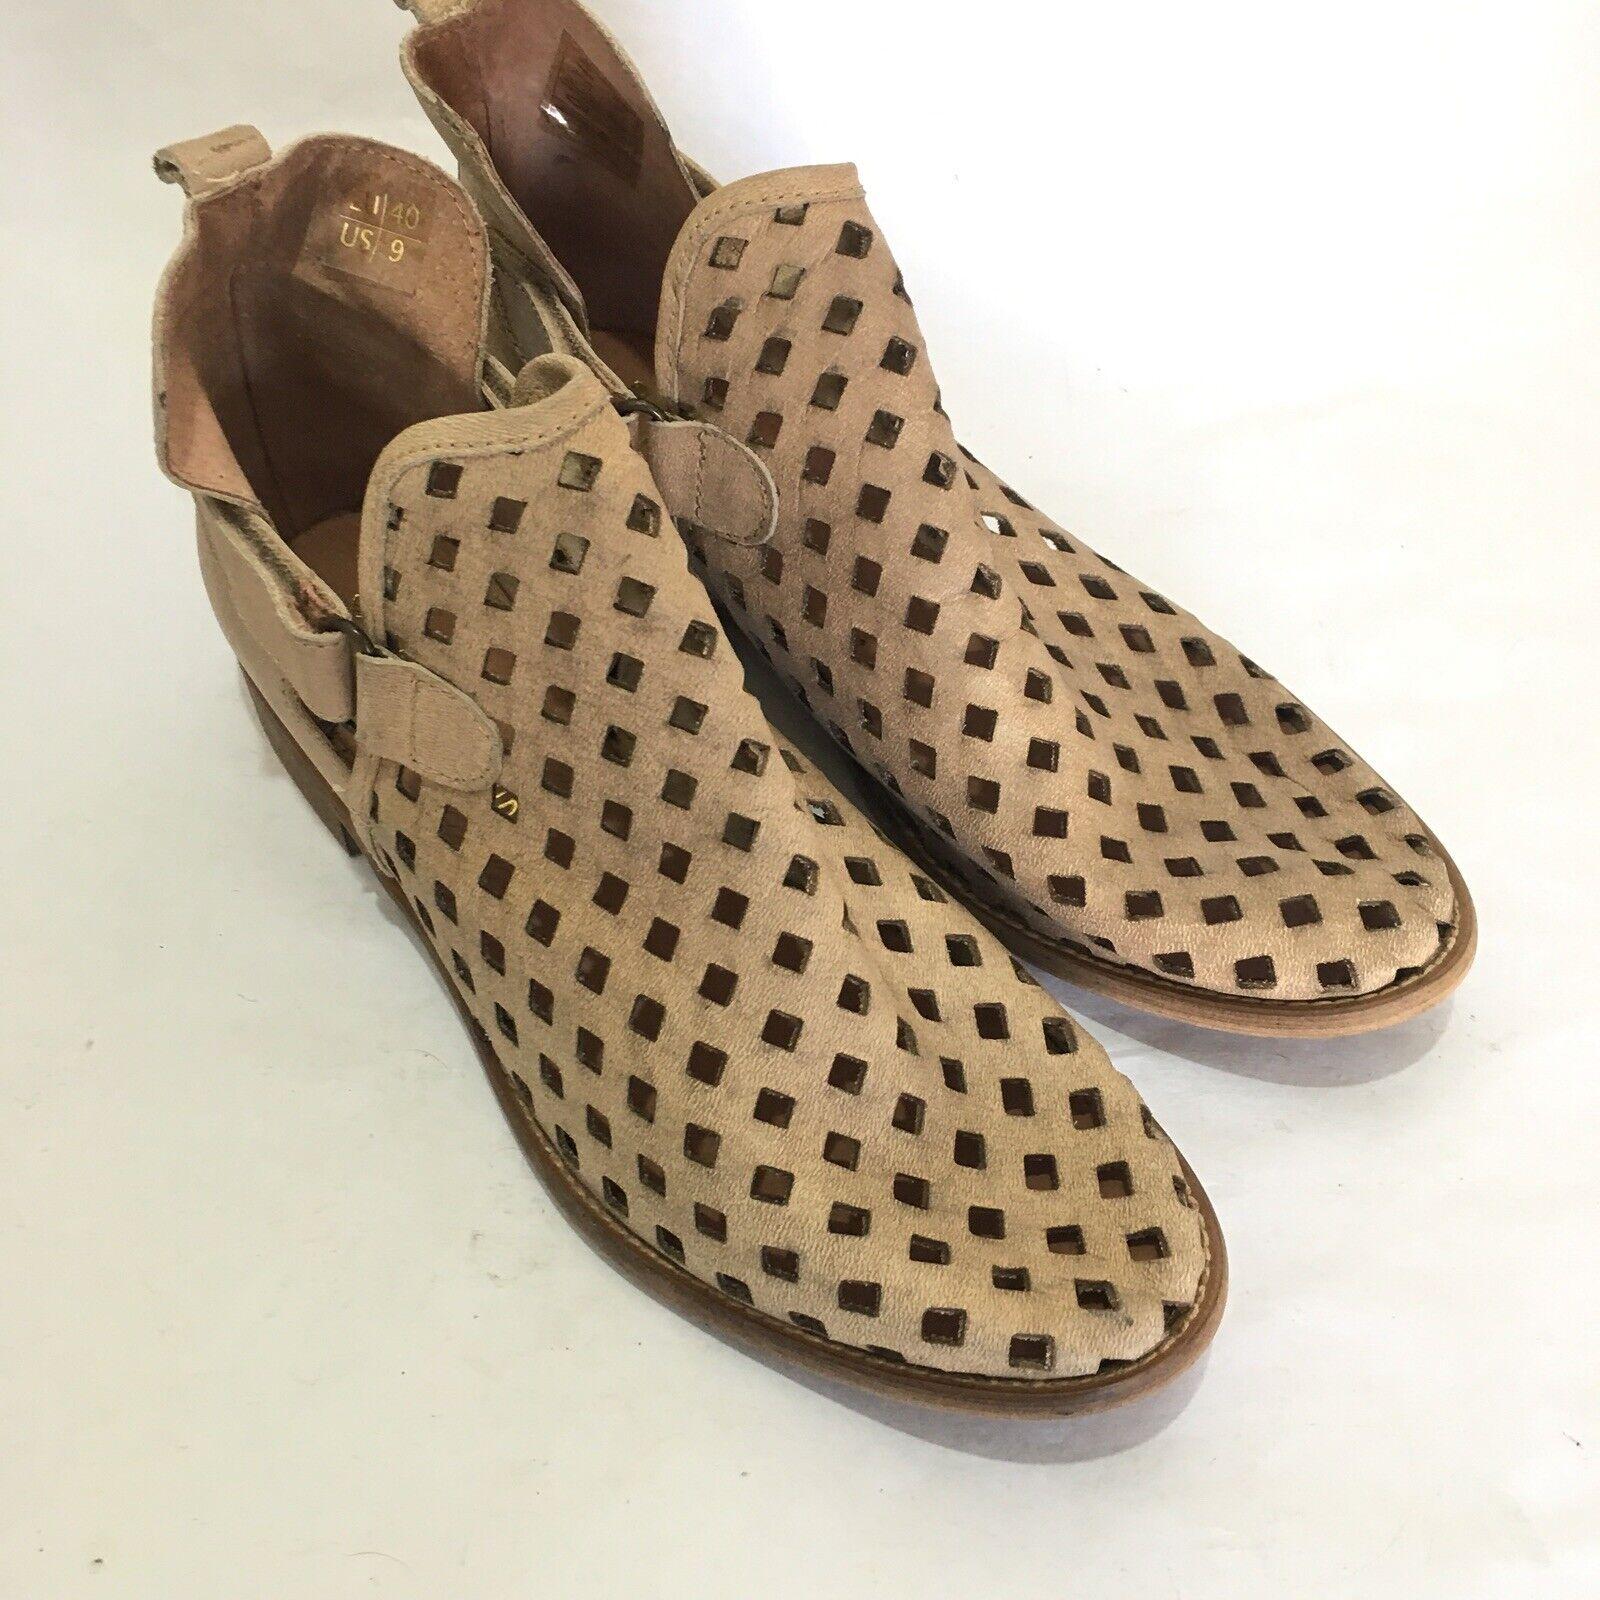 Musse & Cloud Womens Size 9 Calia Laser Cut Boots Tan Casual Ankle Bootie shoes